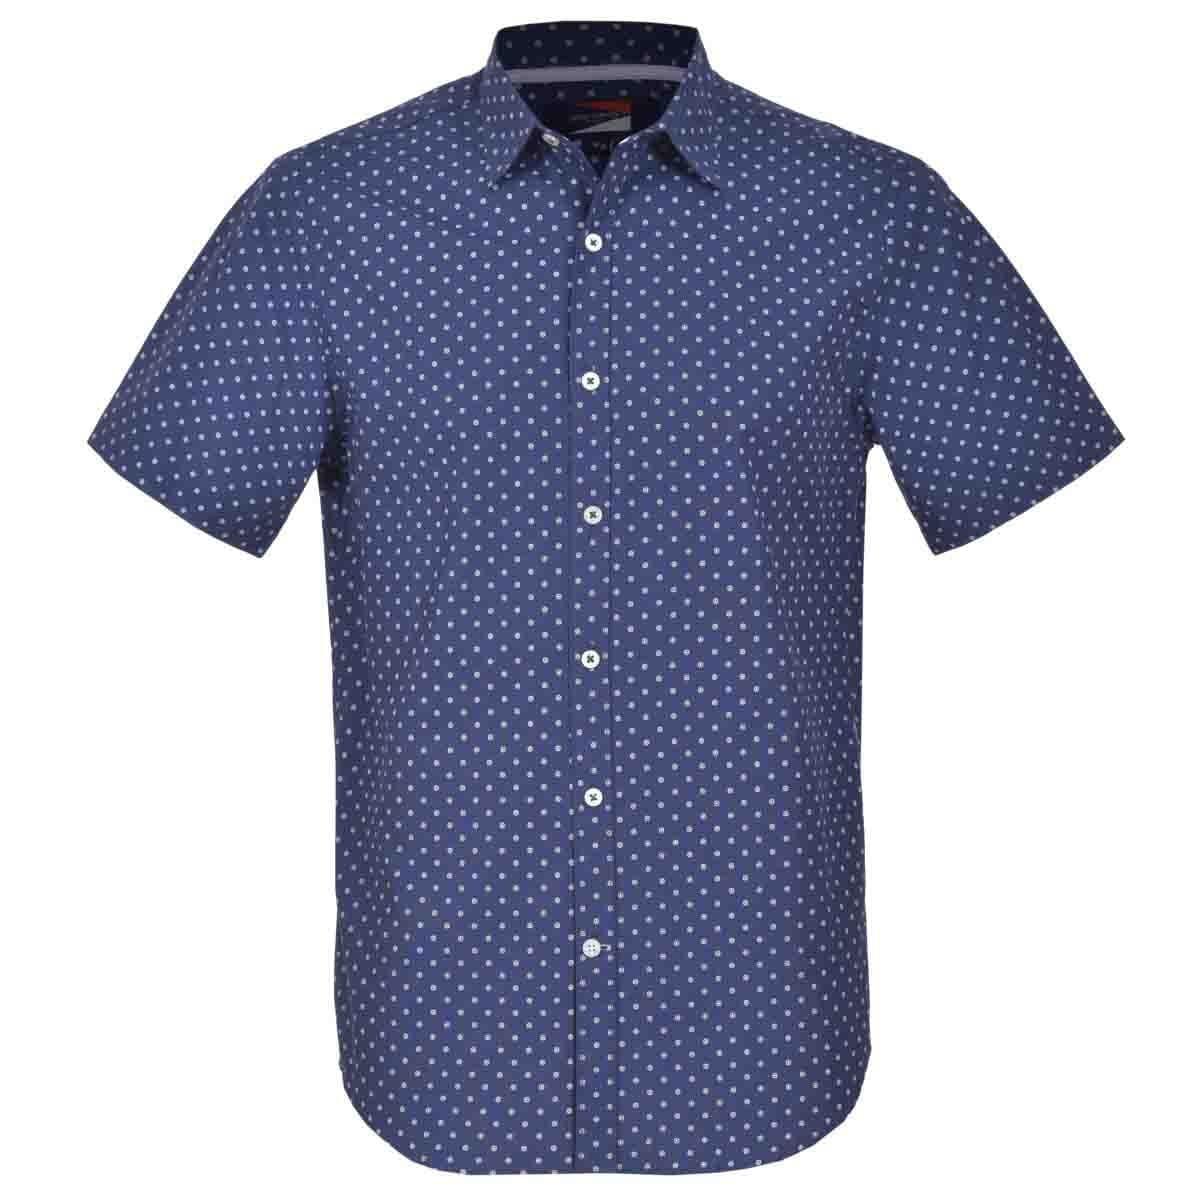 Camisa Manga Corta Casual Esmpada Azul Carlo Corinto